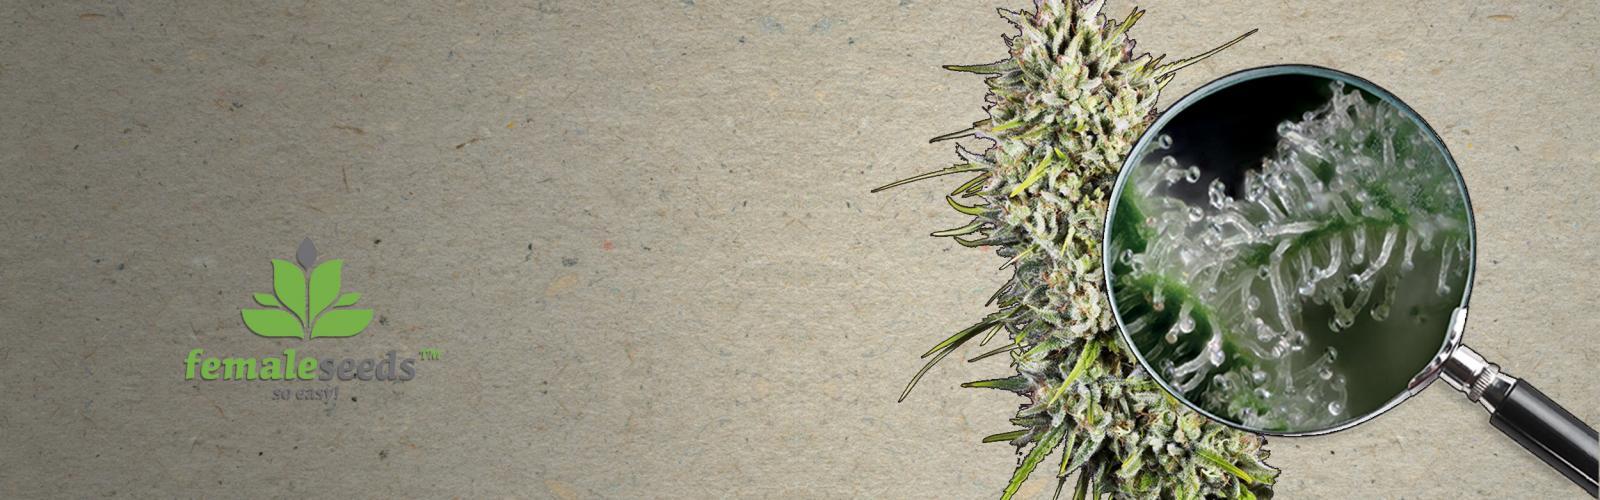 Graines de Cannabis Female Seeds